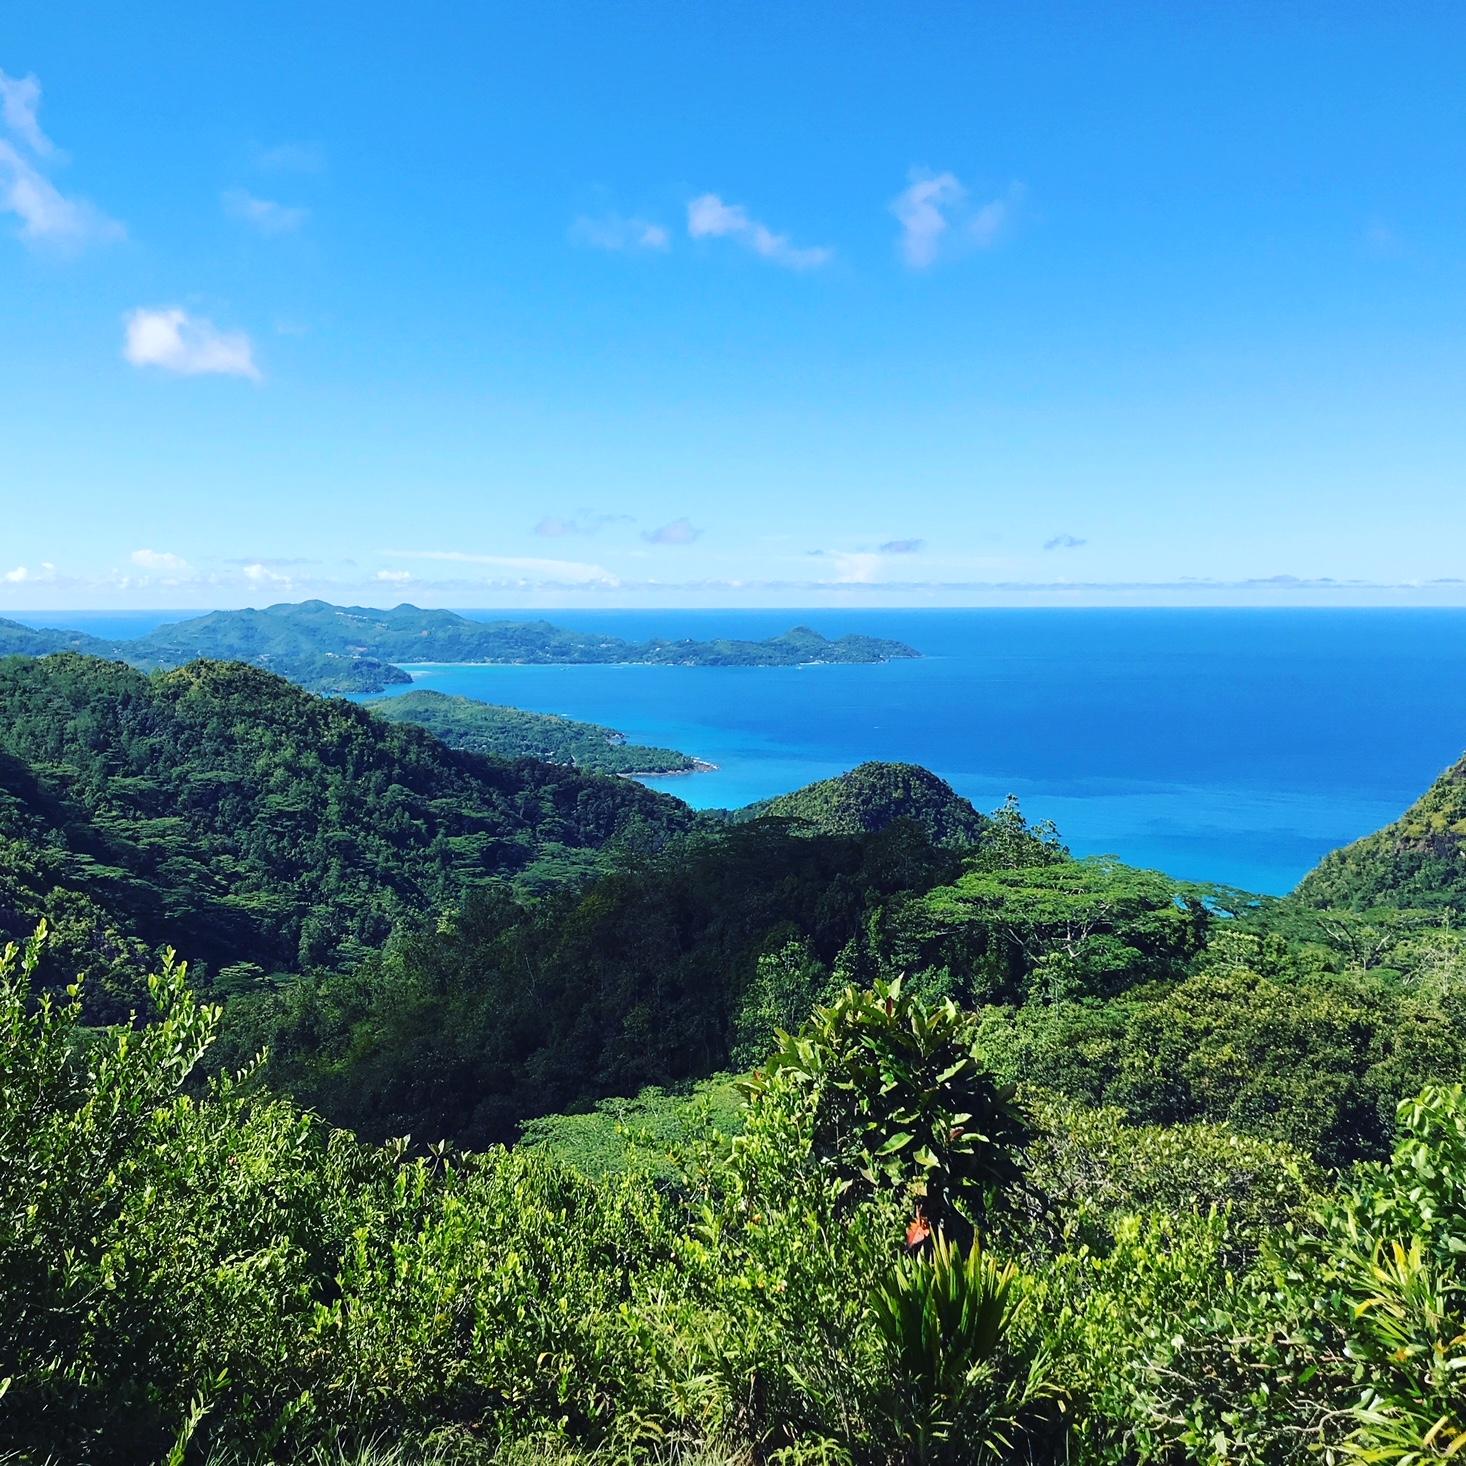 View of the ocean, Mahe Island, Seychelles